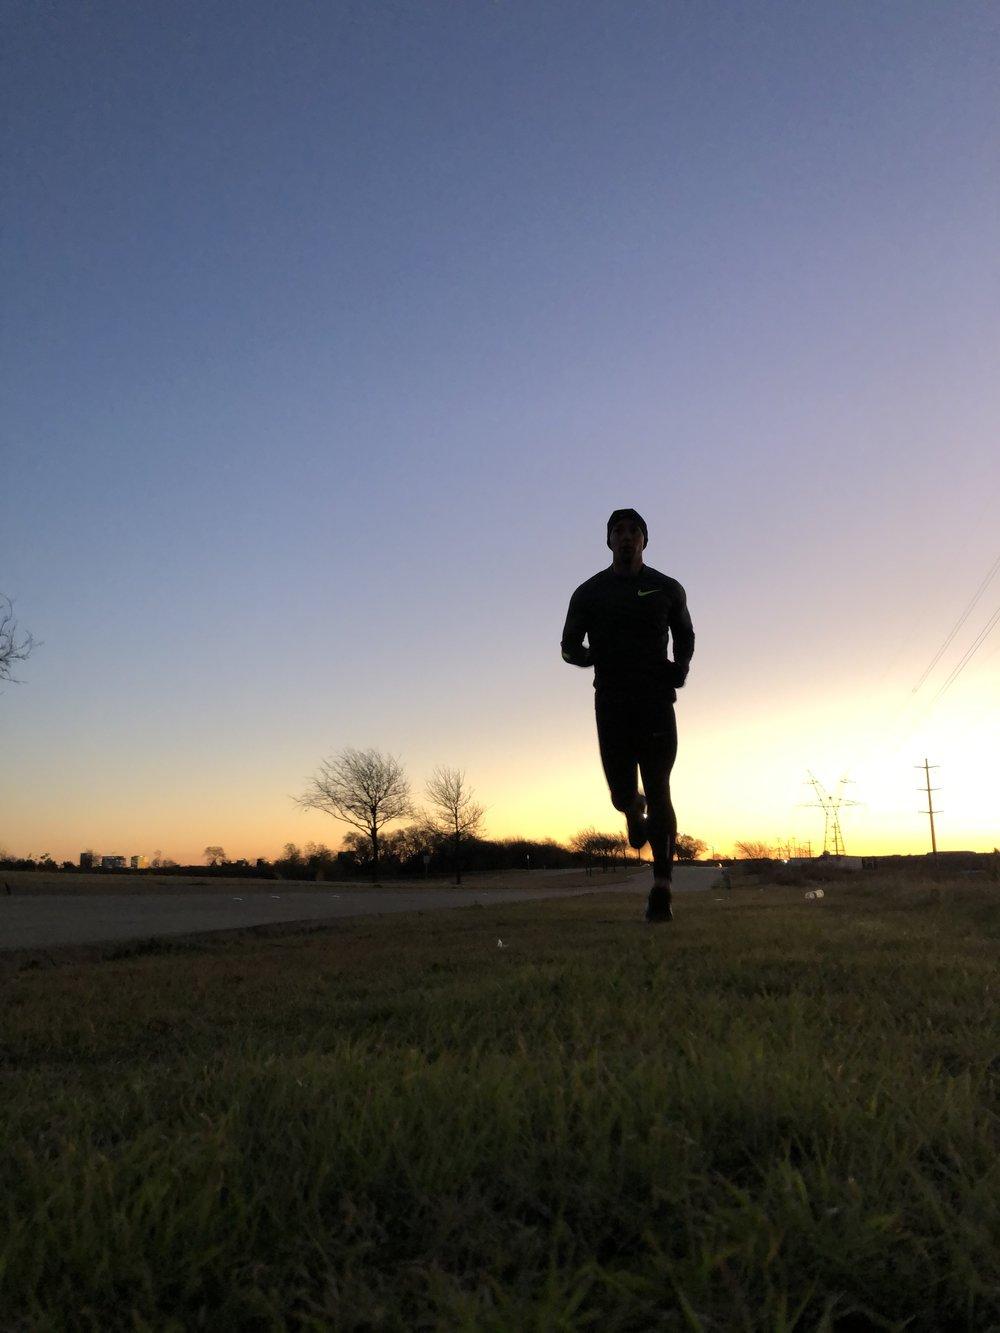 Morning Long run Marathon Training before the Sun comes up over Dallas, Texas